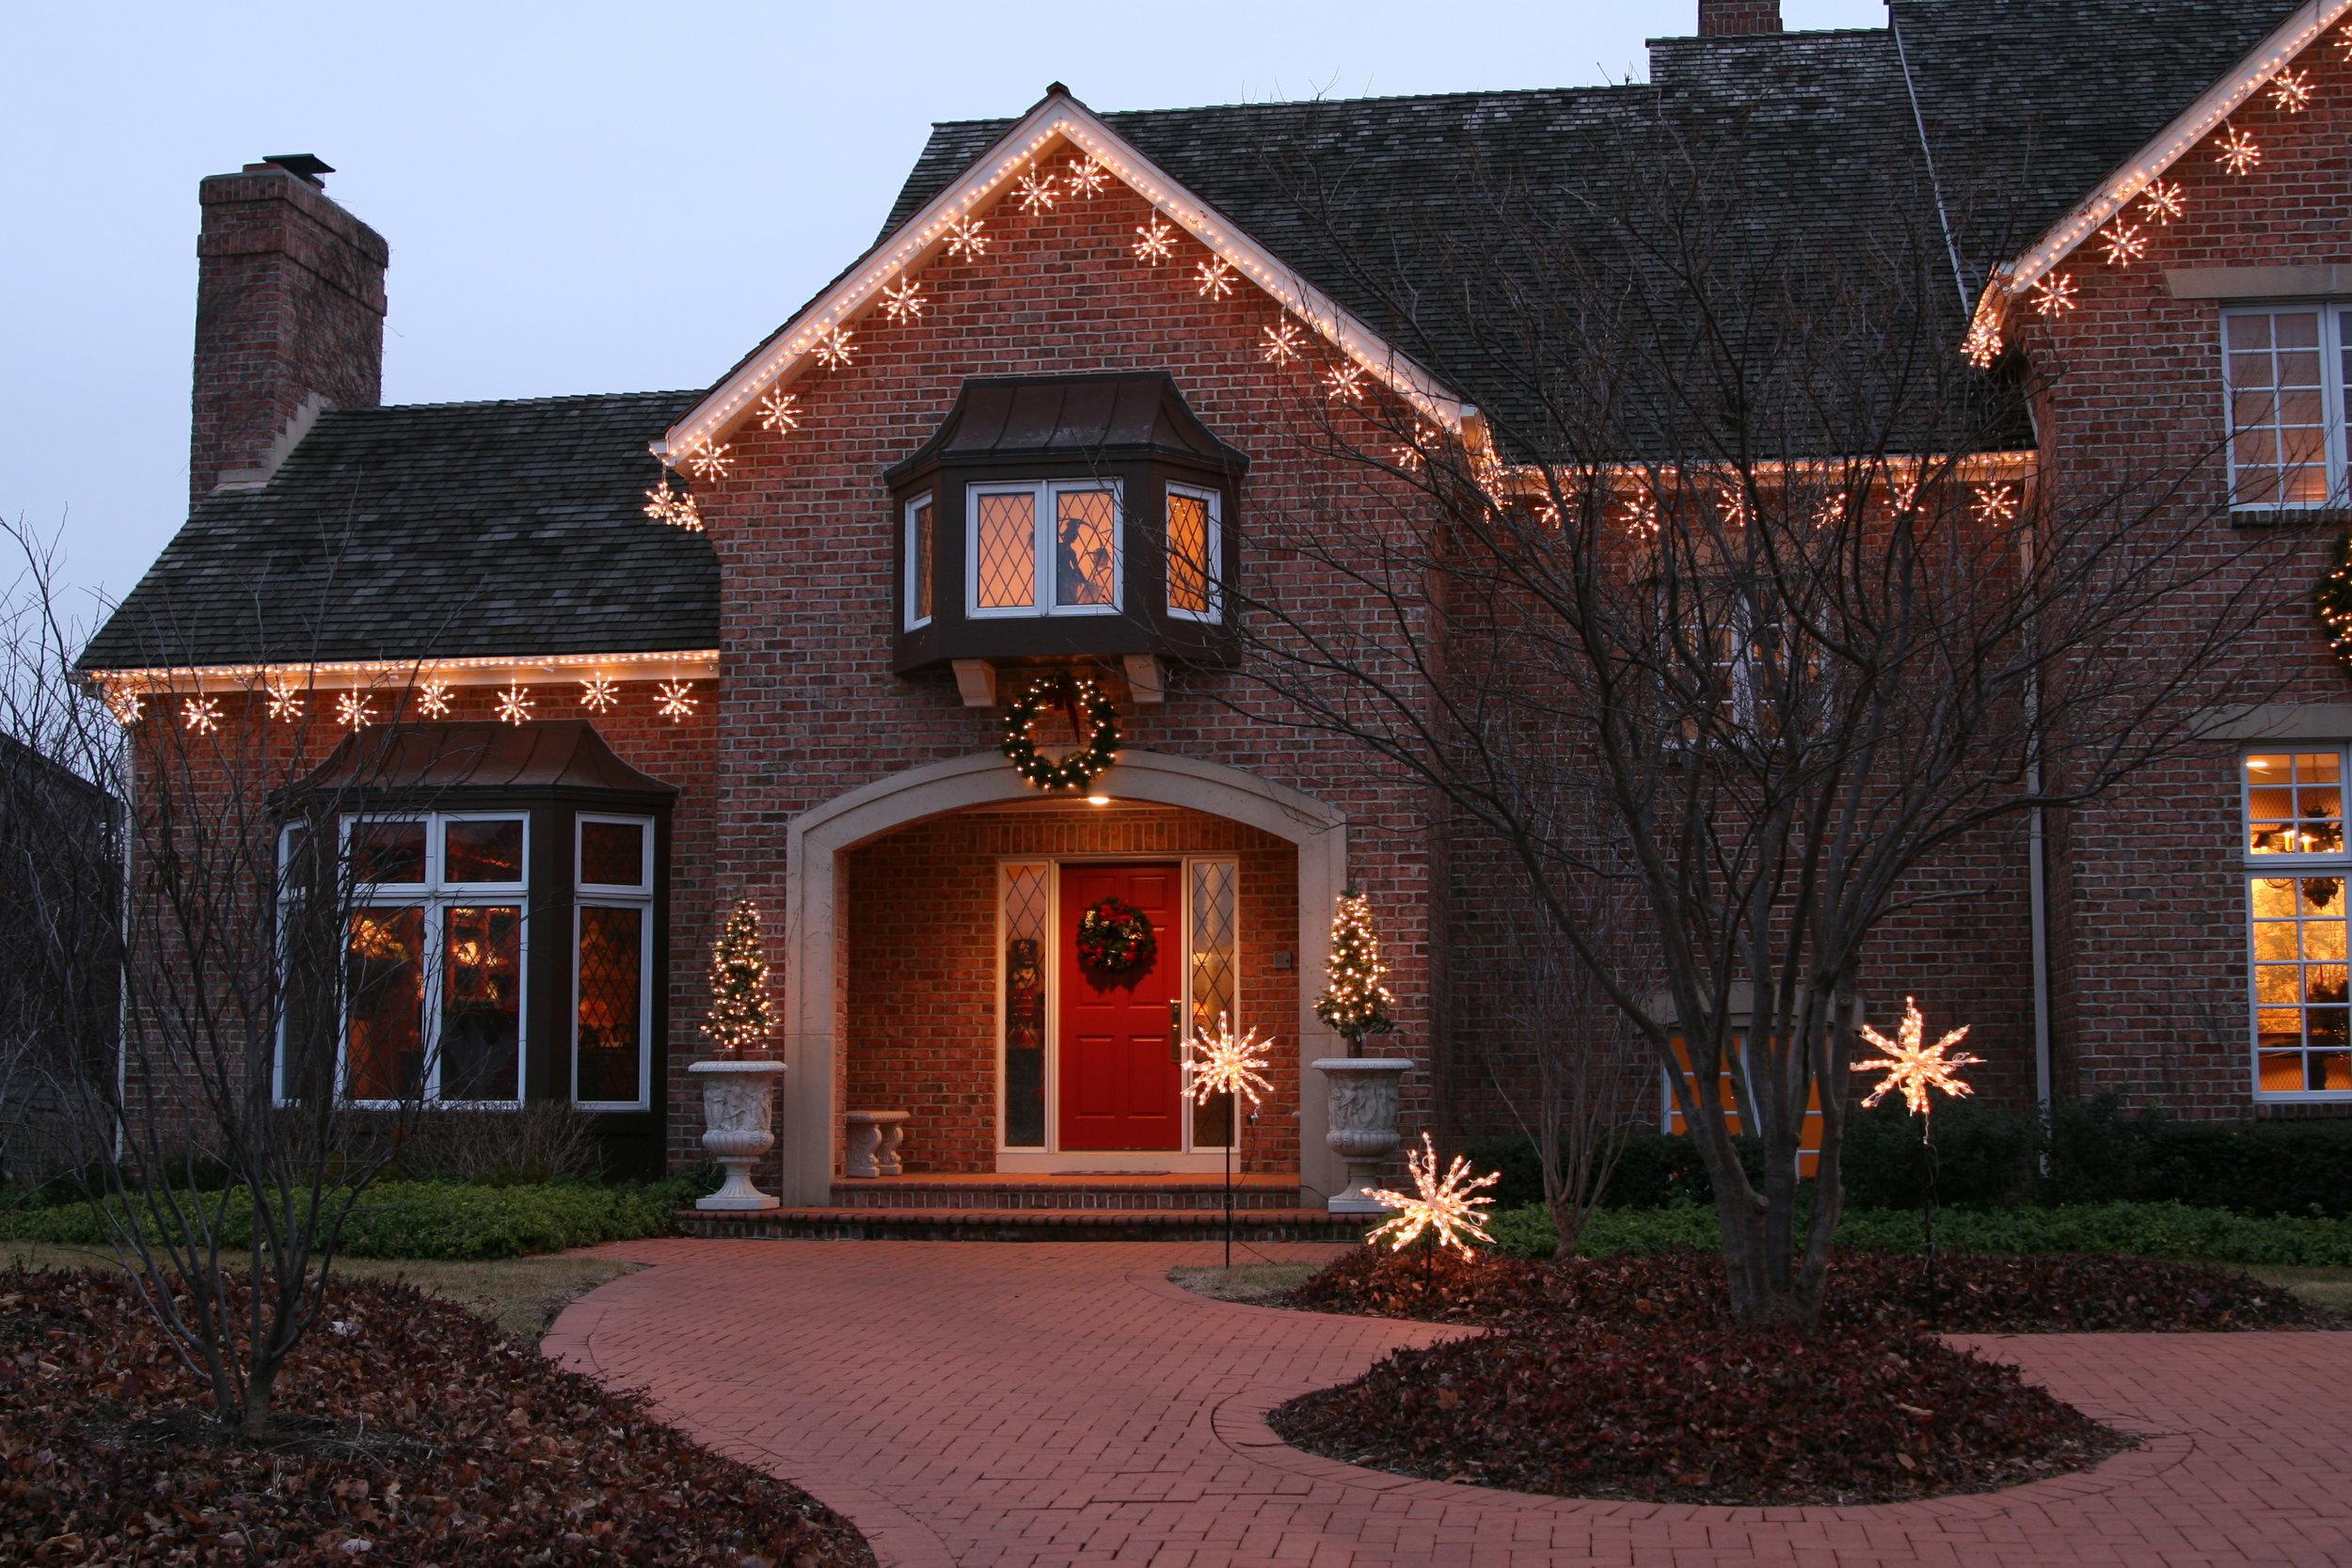 glitter and glow chrismas decor residential exterior (45).JPG